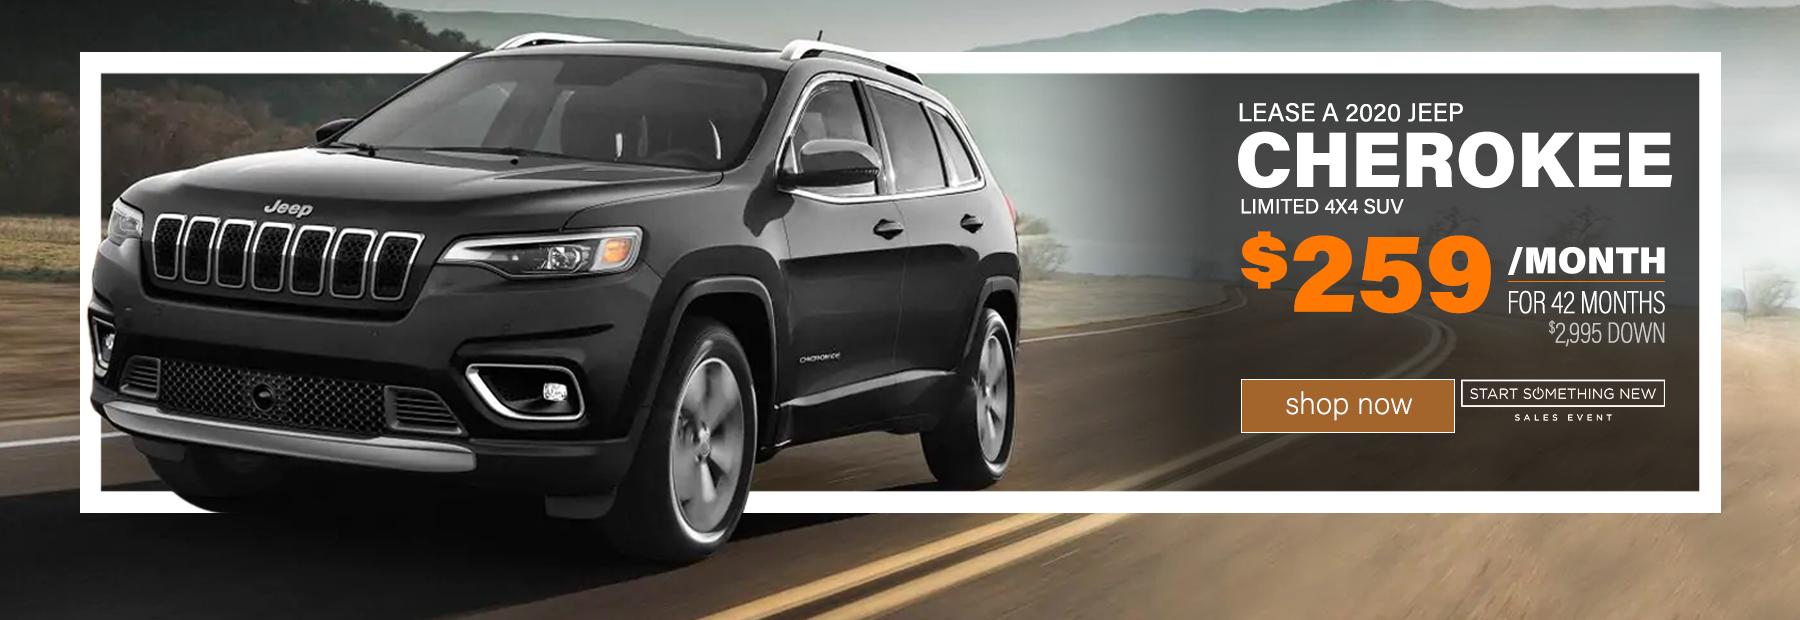 new-2020-jeep-cherokee-lease-dayton-ohio